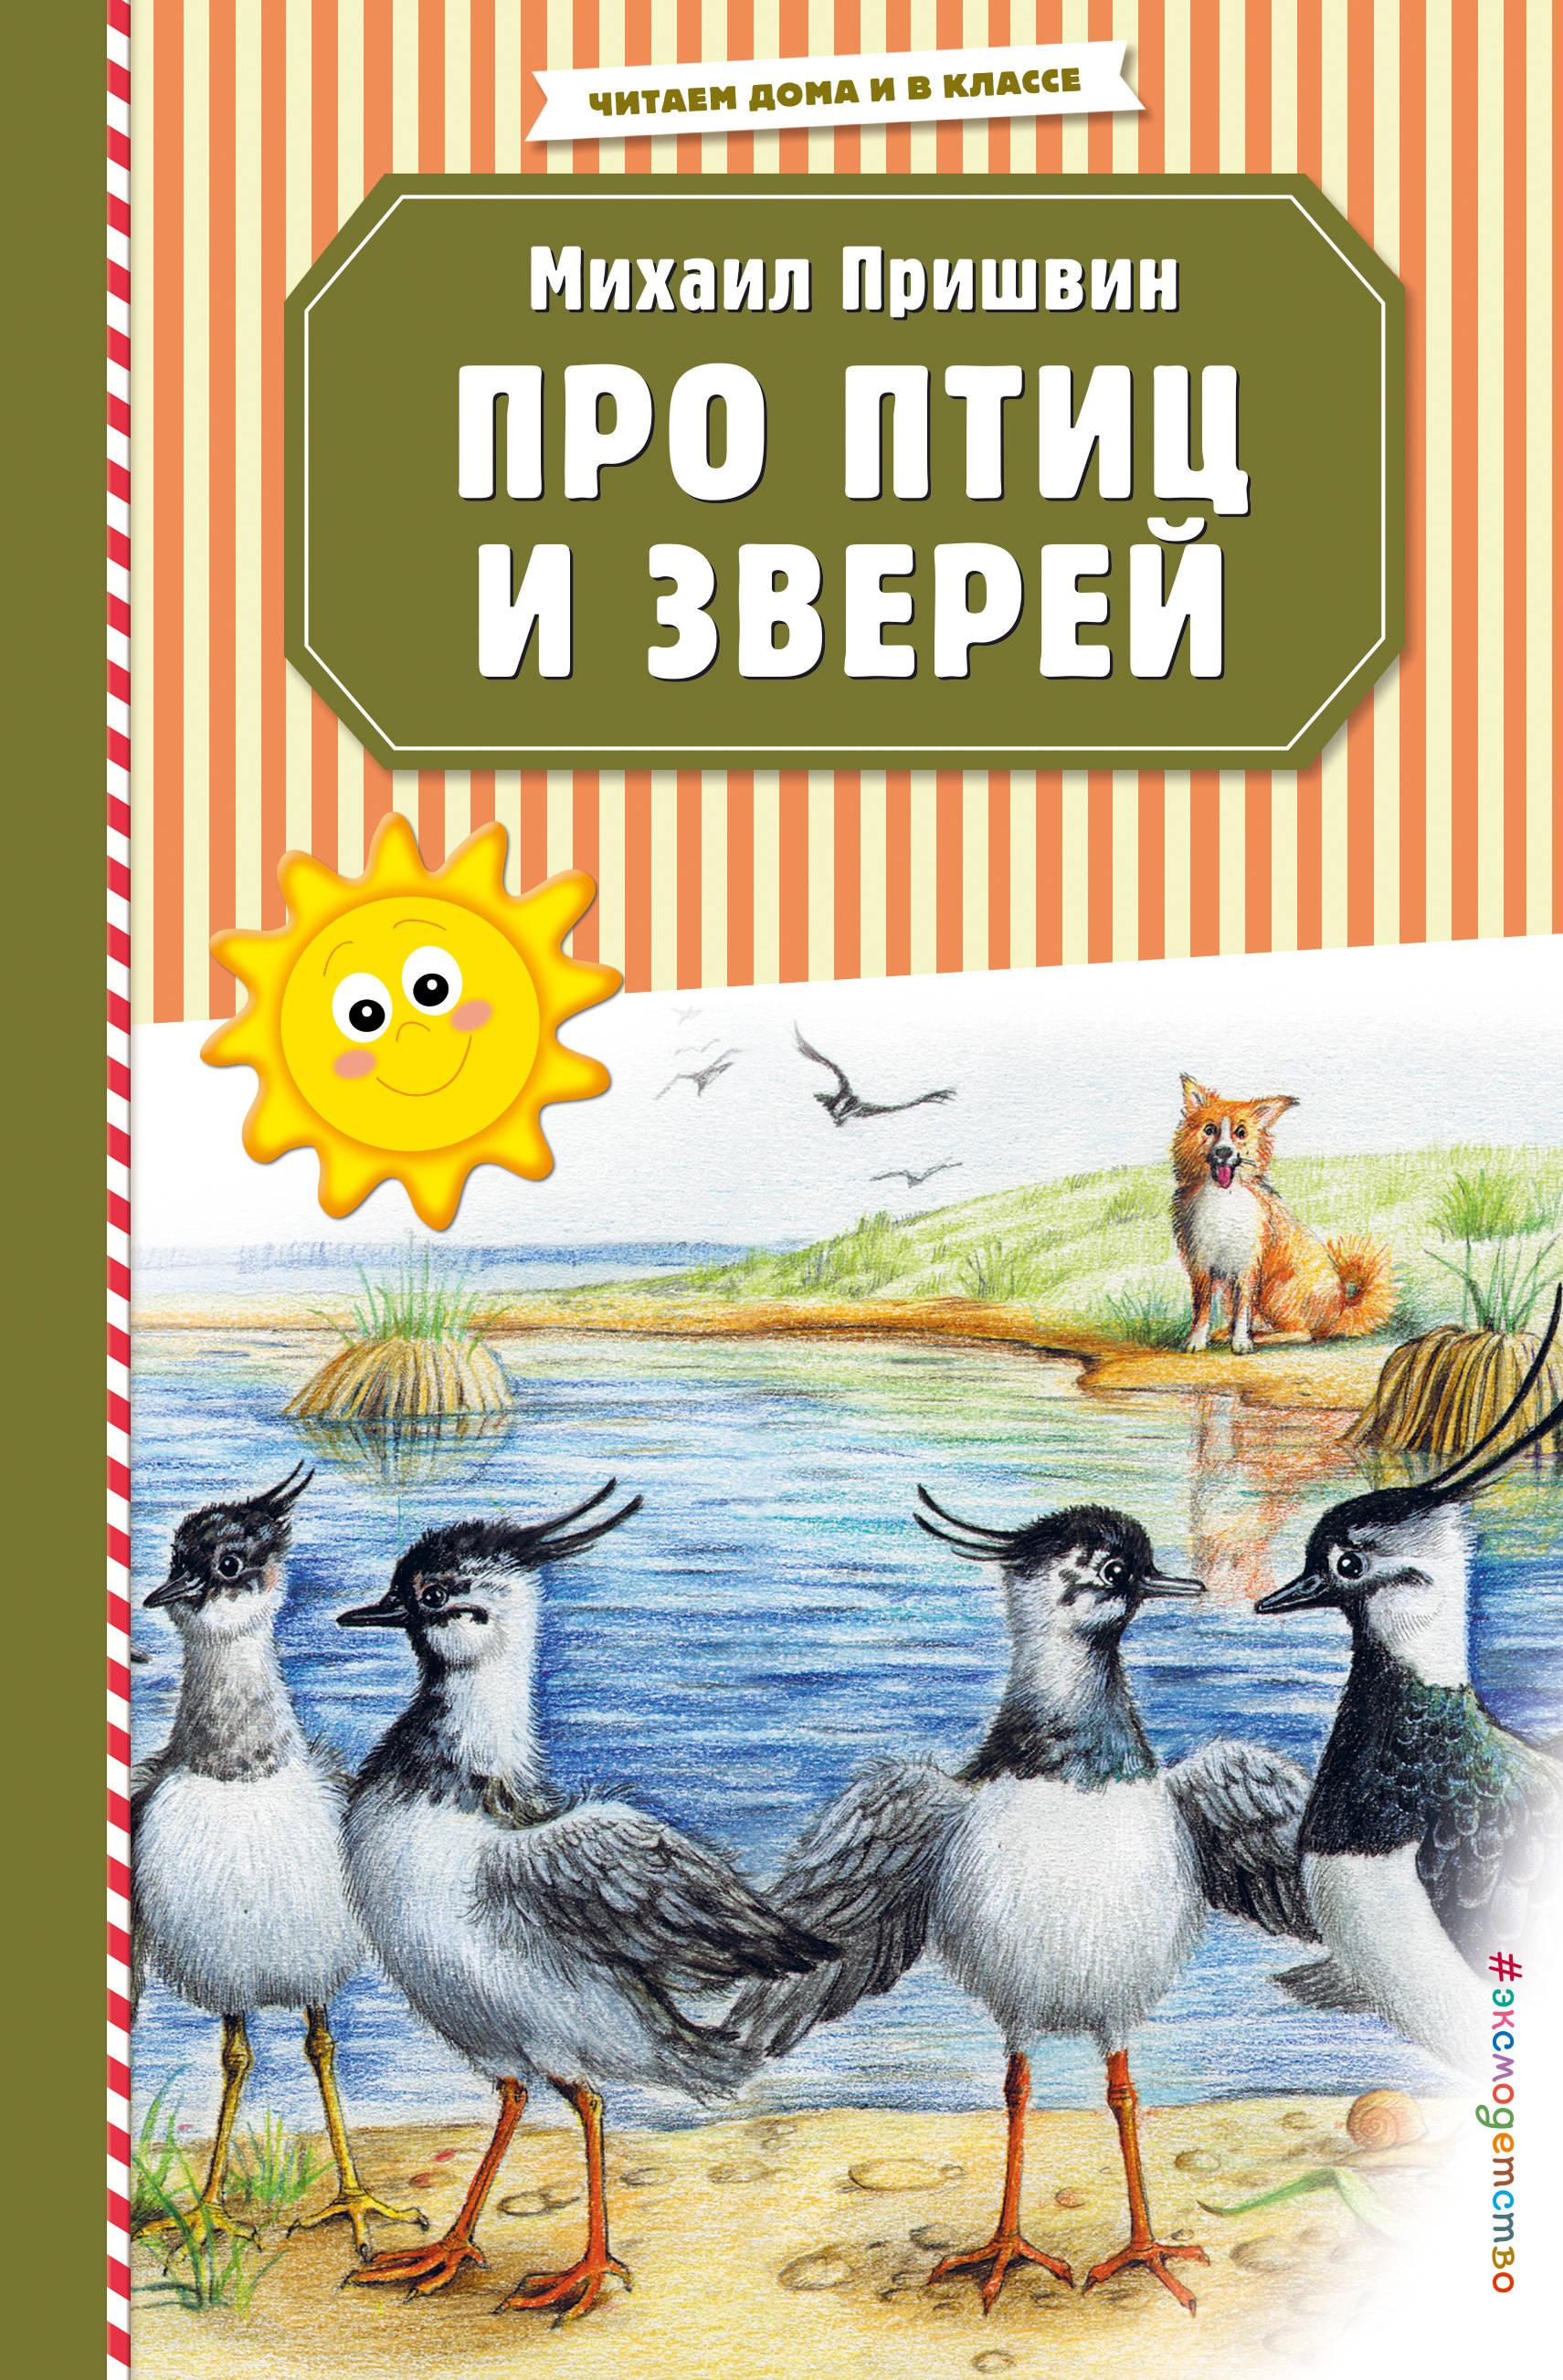 Pro ptits i zverej (il. M. Belousovoj)